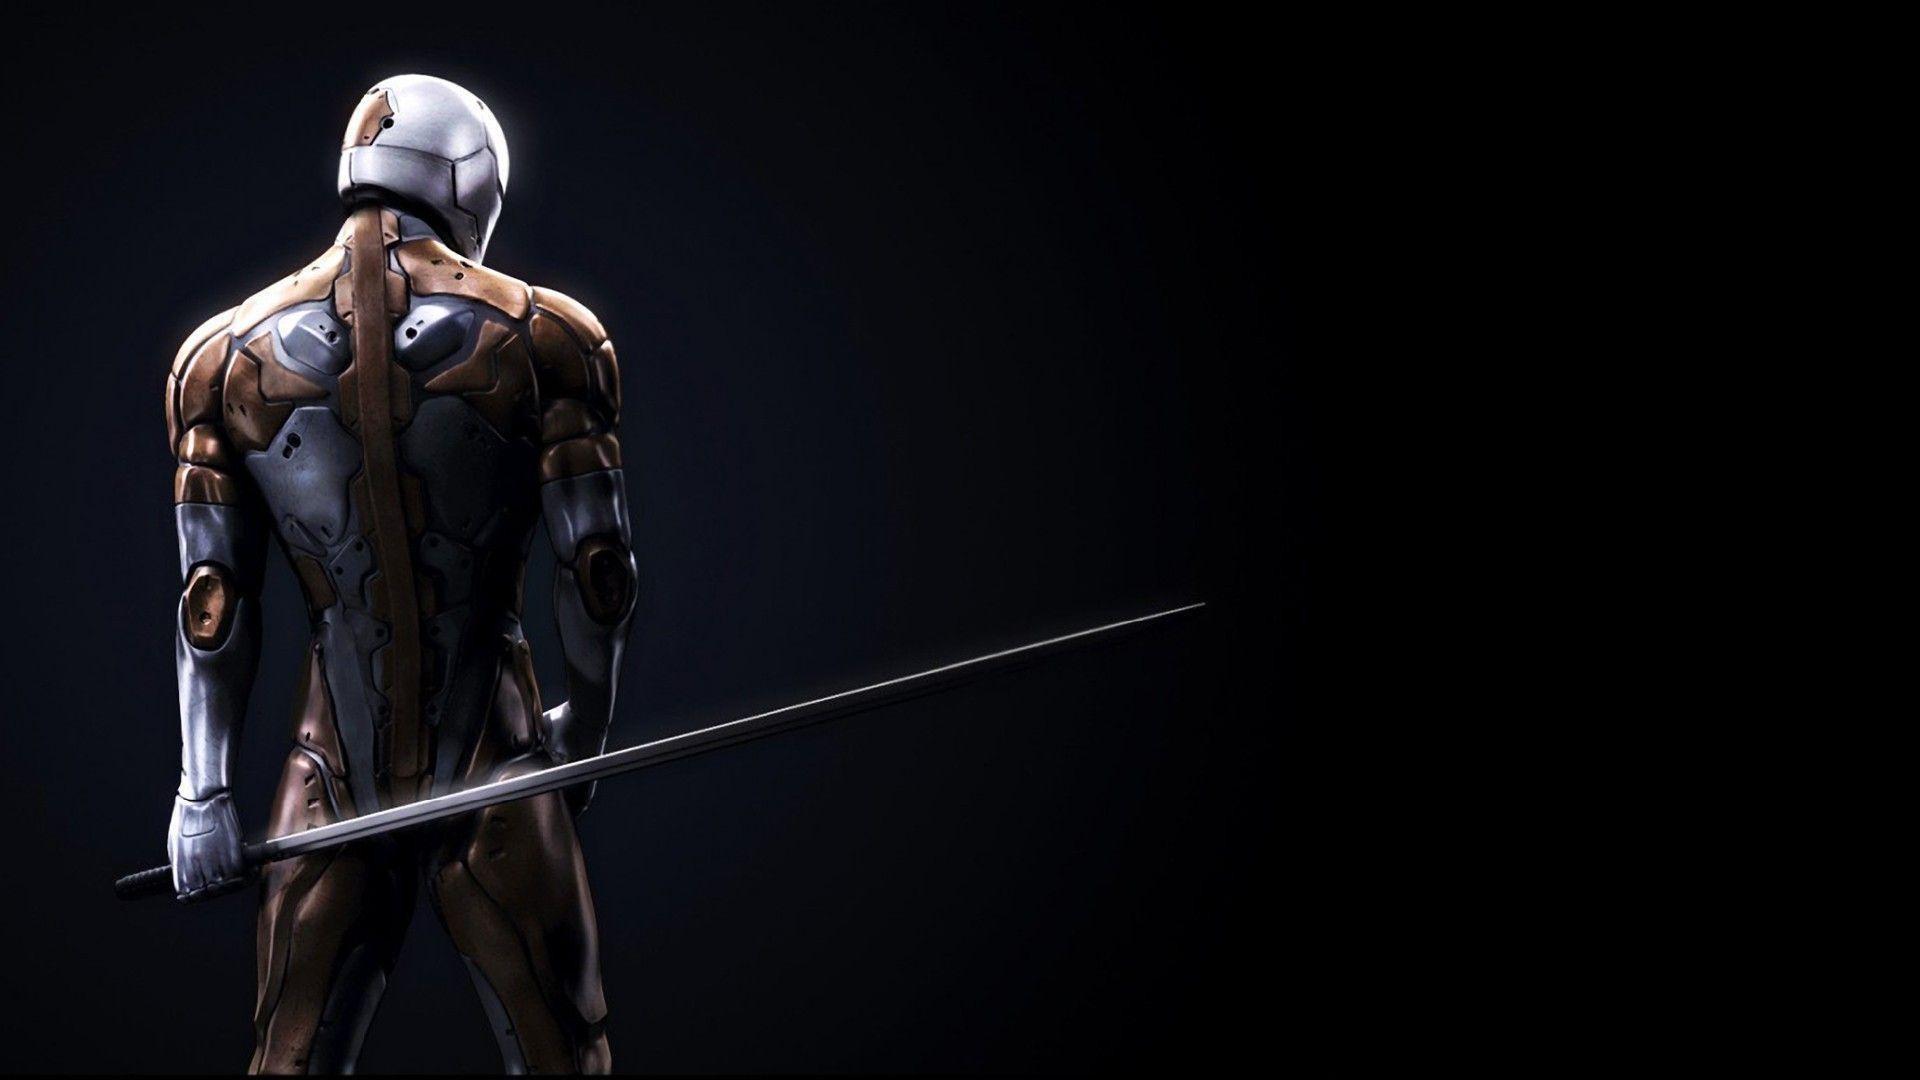 Res: 1920x1080, Gray Fox Metal Gear Solid Wallpaper  #2228 HD Game .